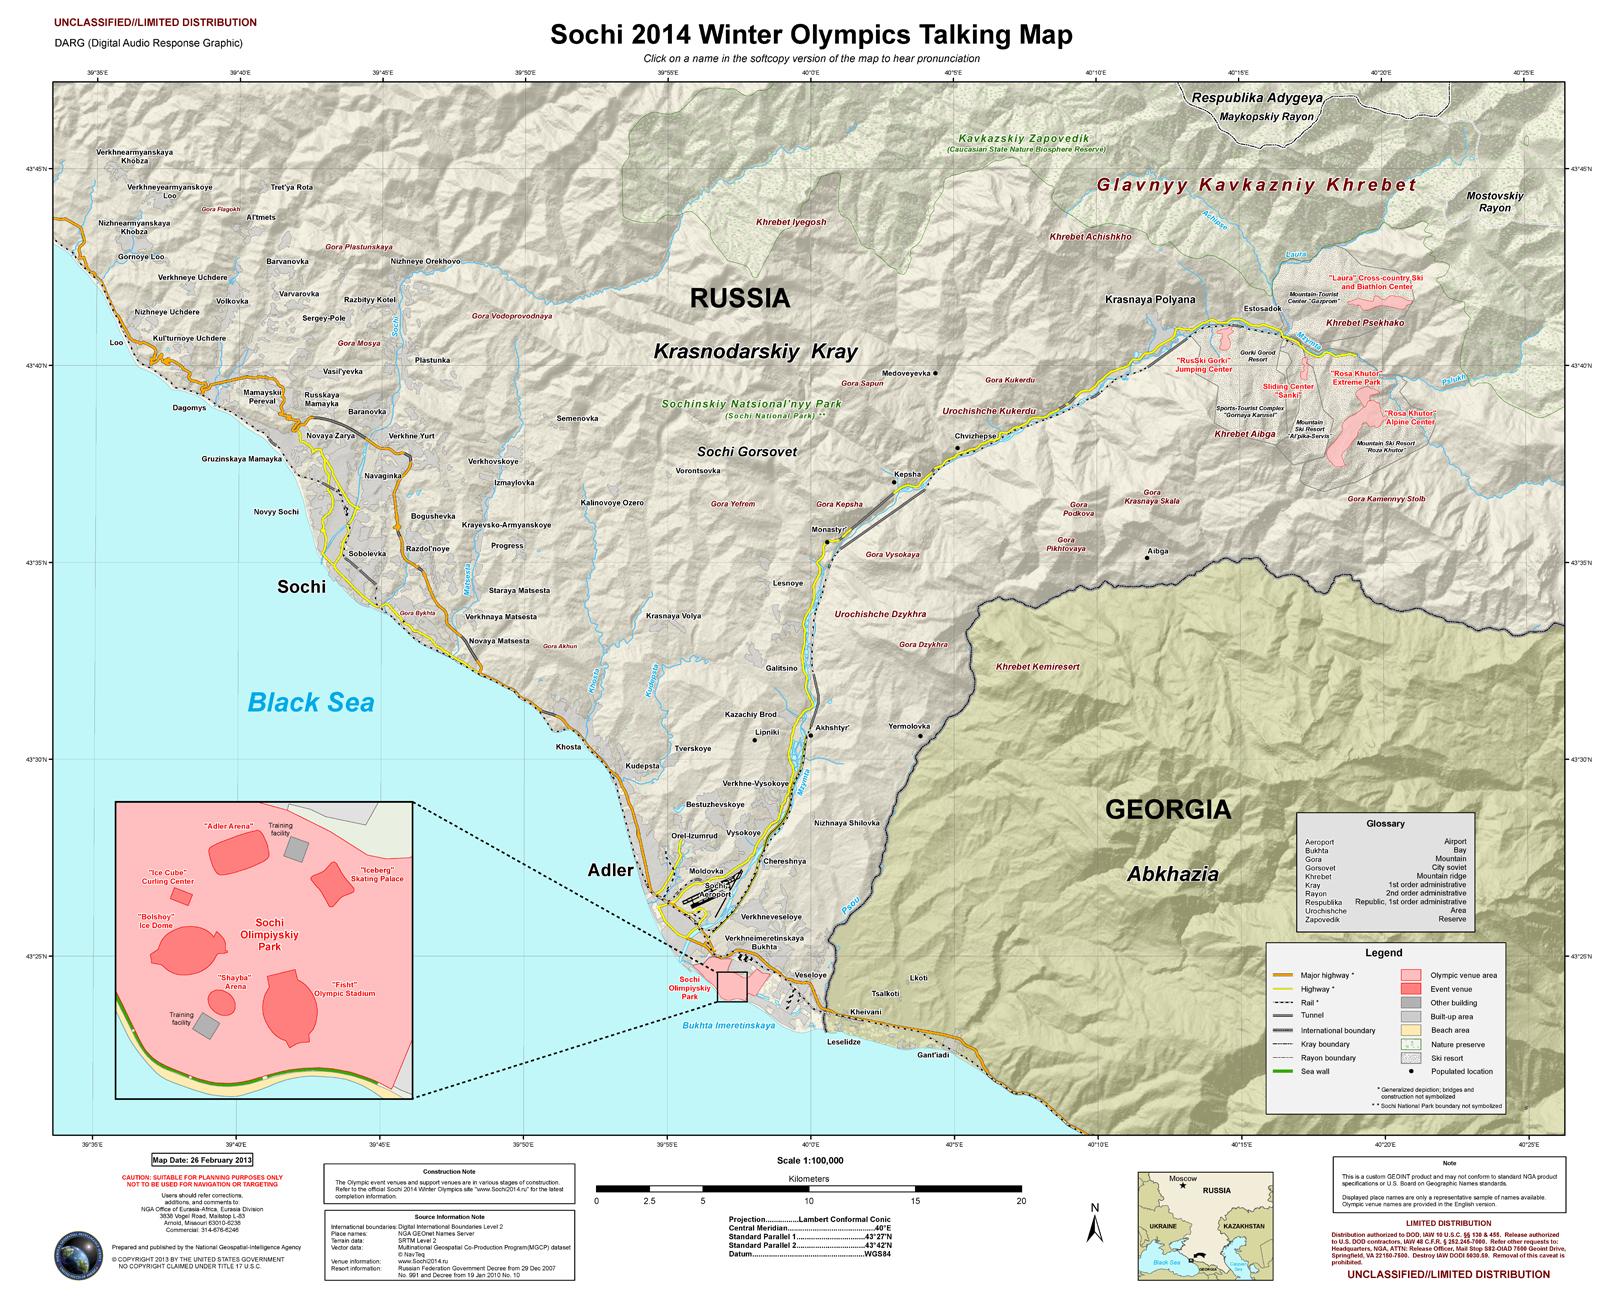 ULIMDIS National GeospatialIntelligence Agency Sochi - Sochi map